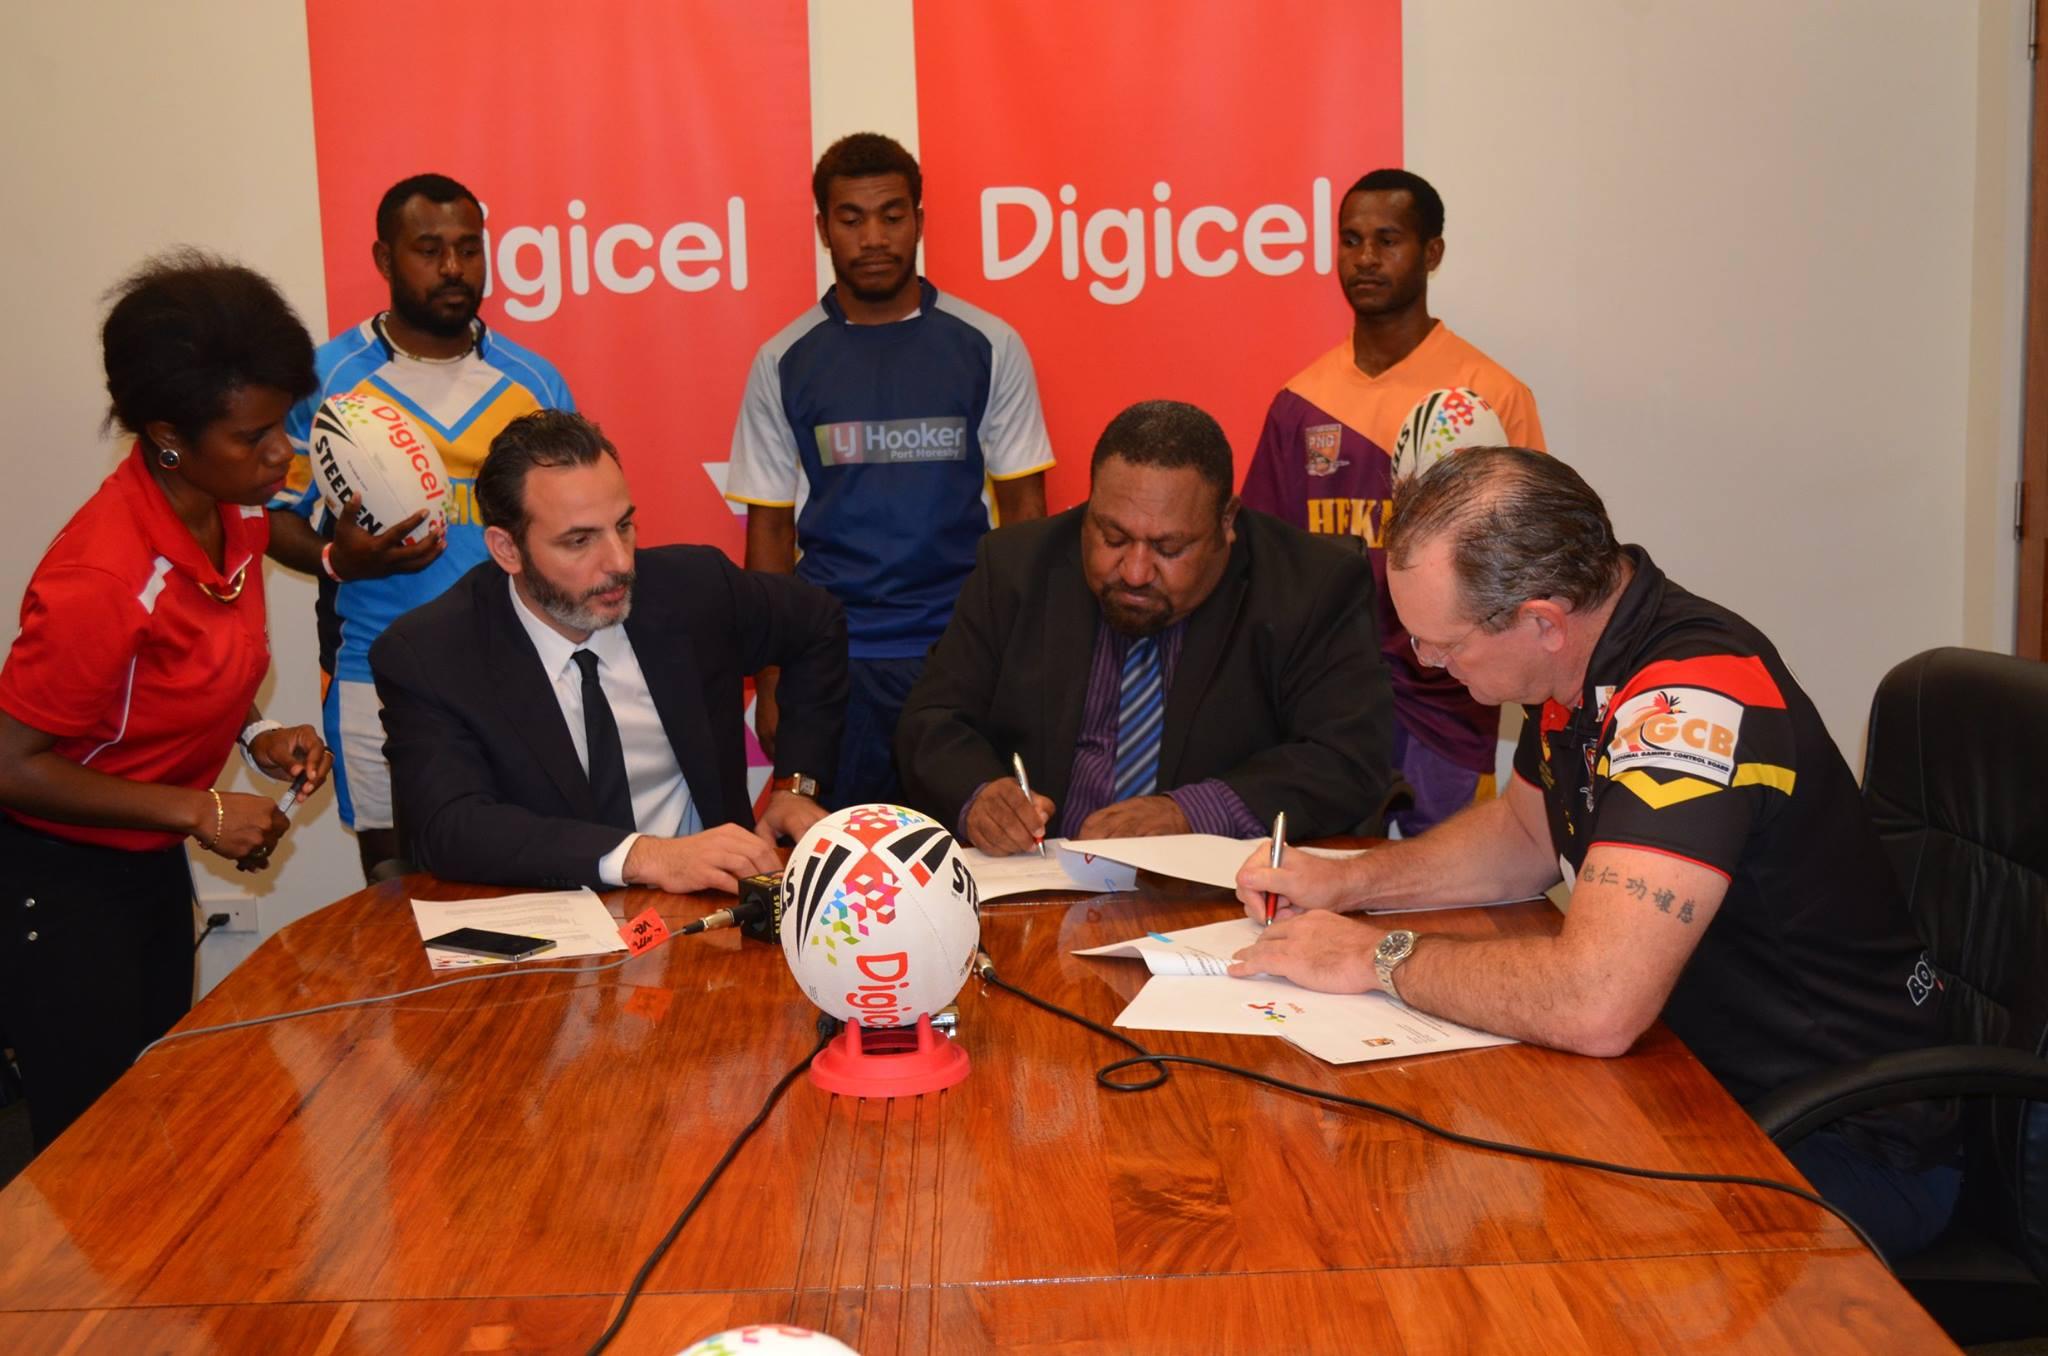 Digicel to sponsor PNGRFL Super Nines